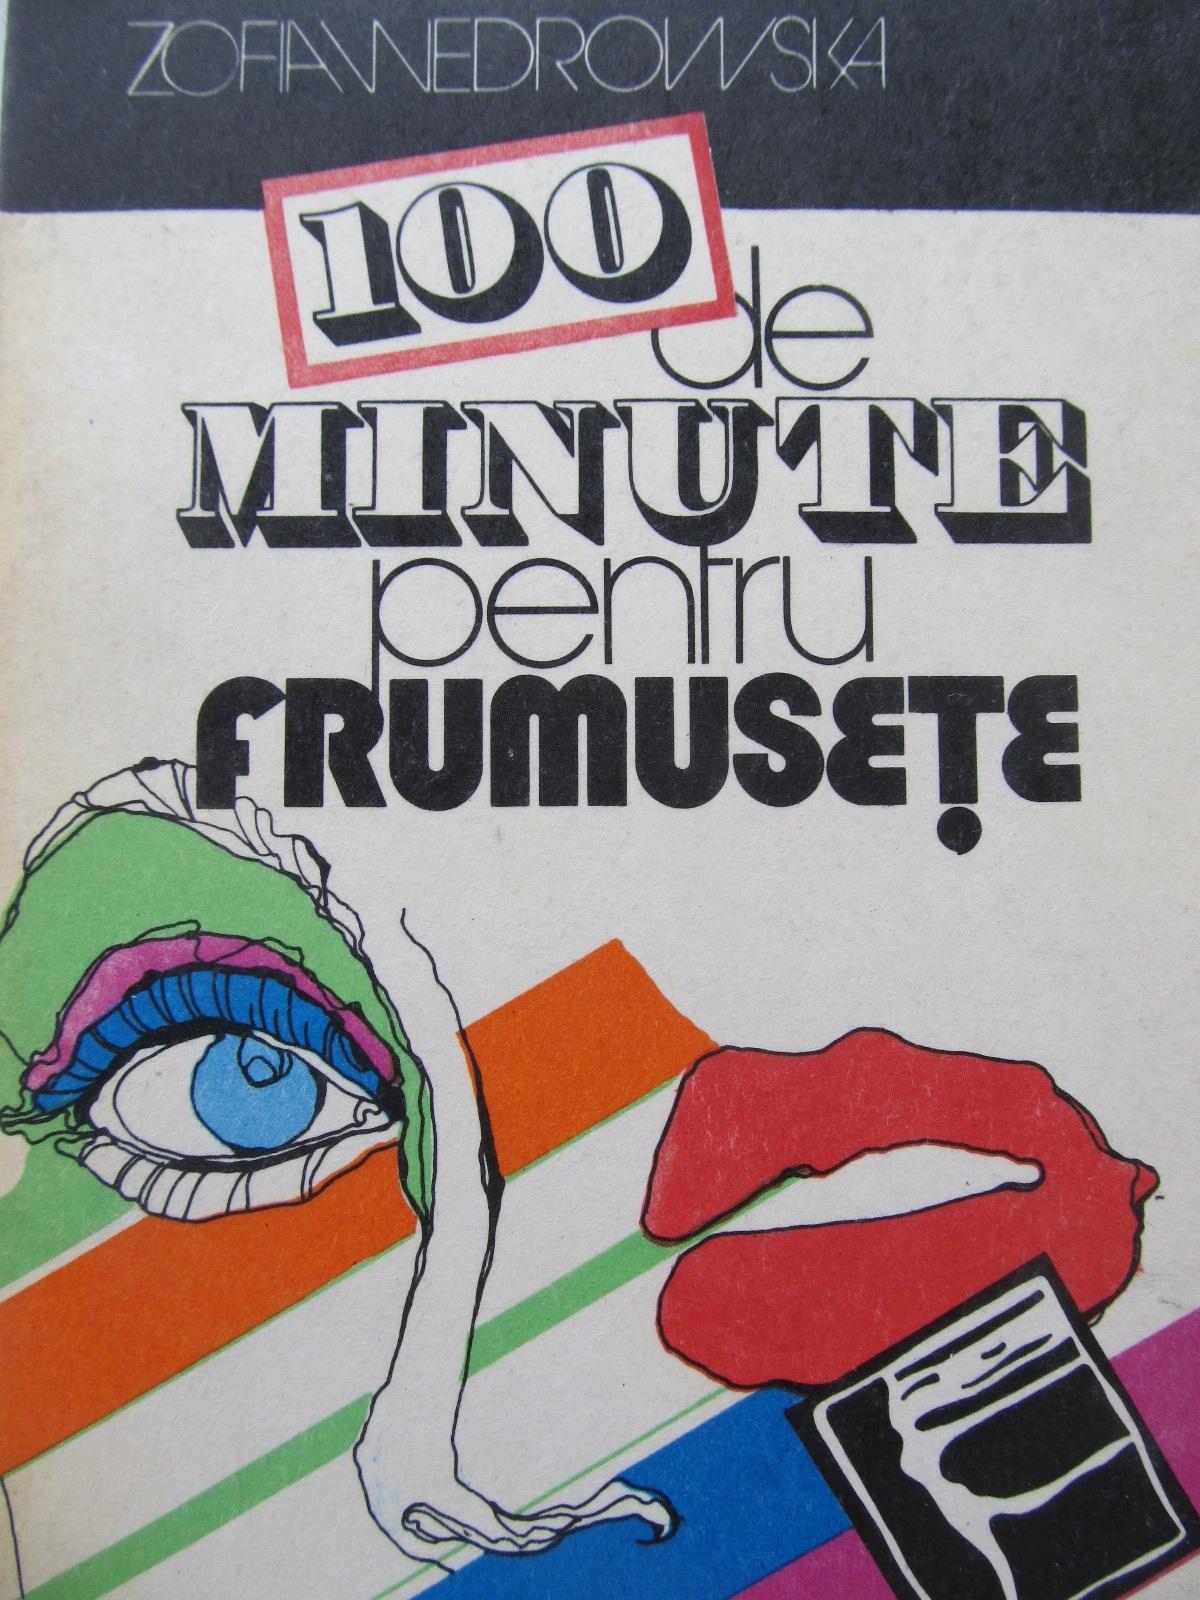 100 de minute pentru frumesete - Zofia Wedrowska | Detalii carte